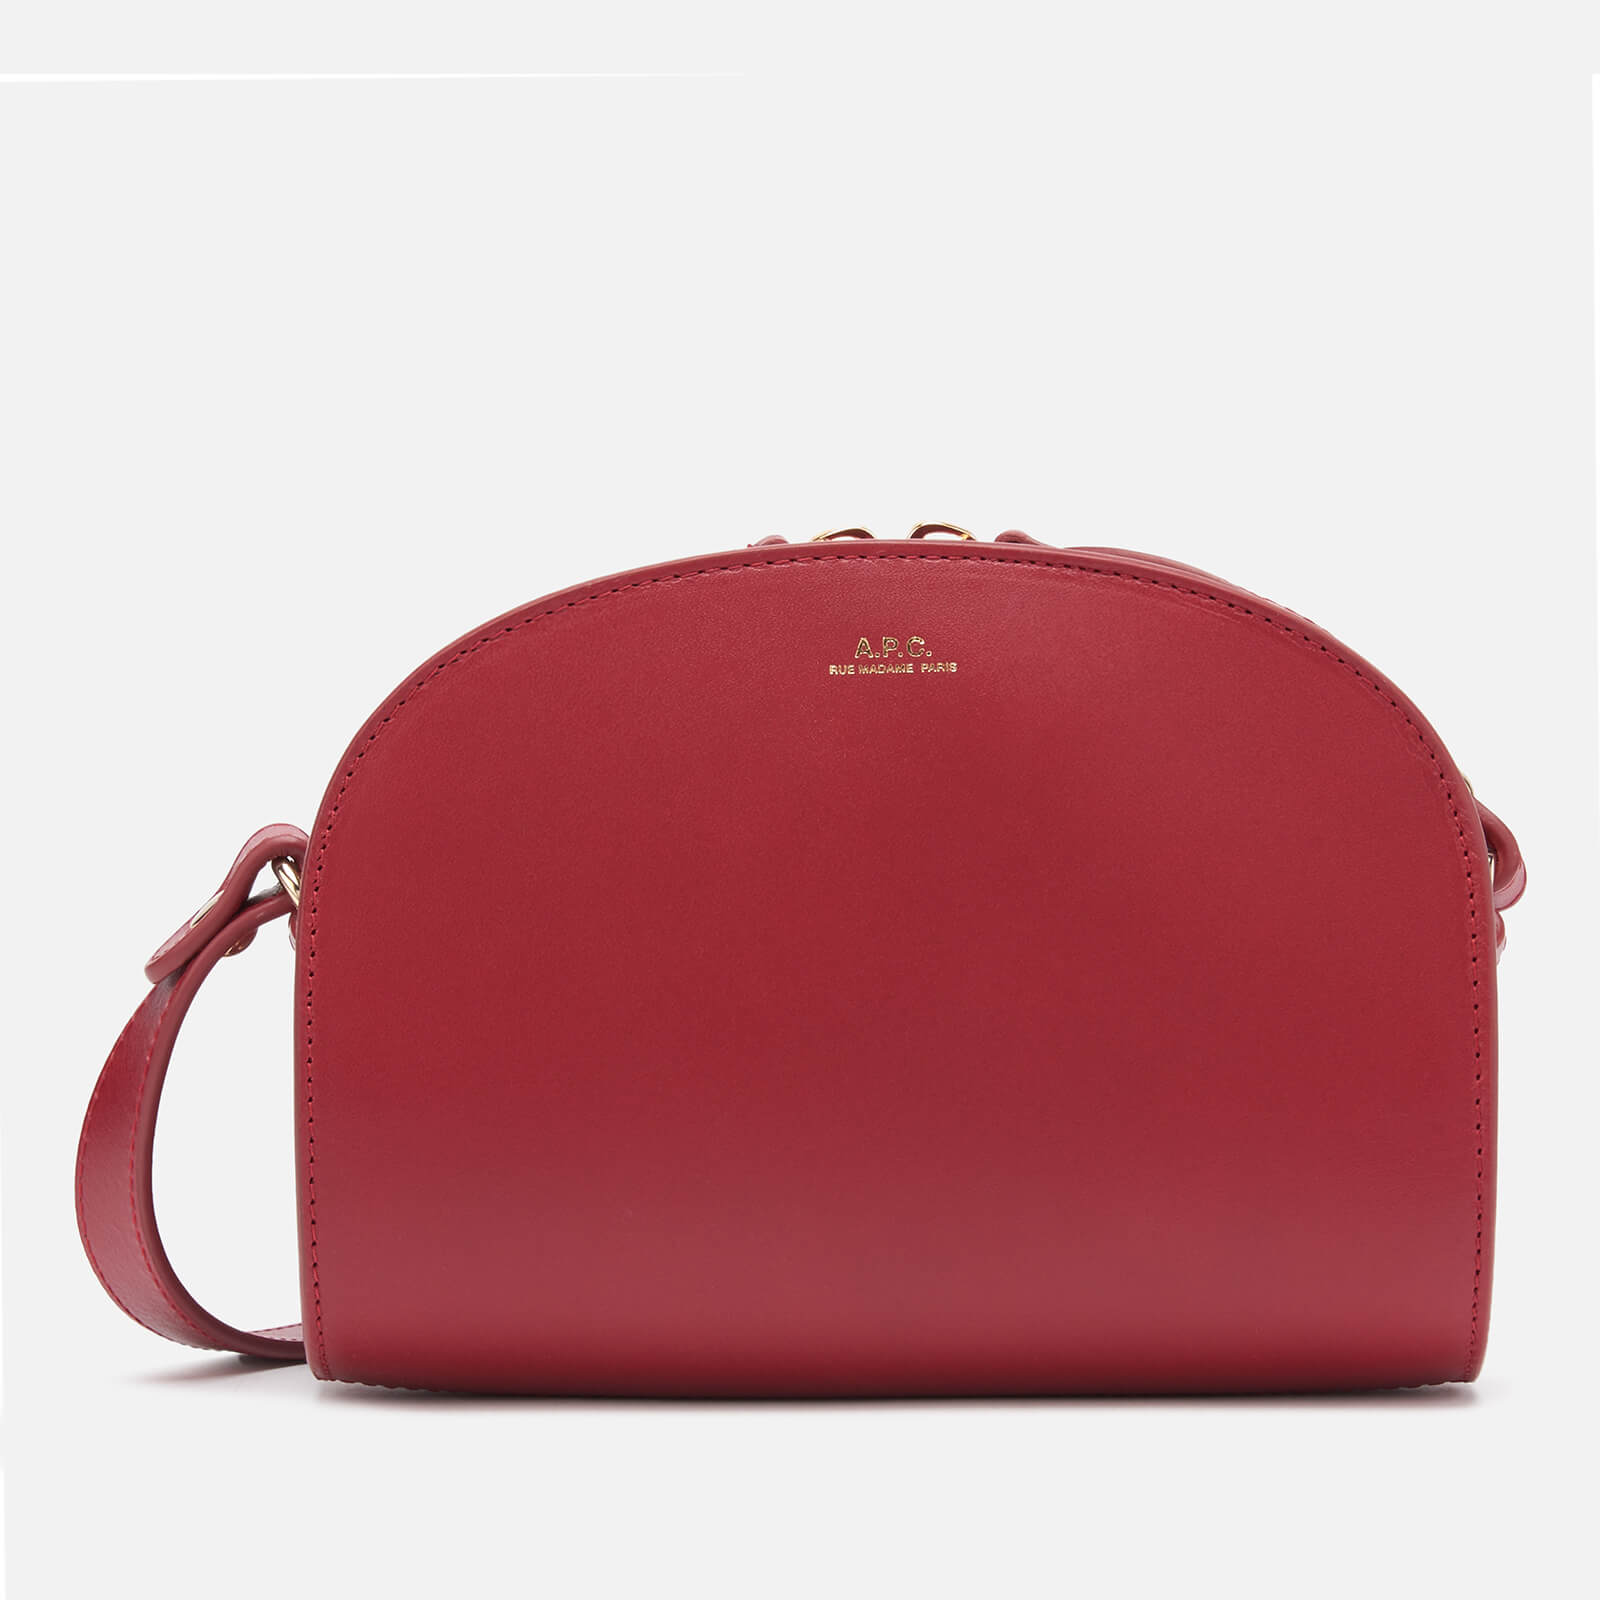 A.P.C. Women's Mini Demi-Lune Cross Body Bag - Red